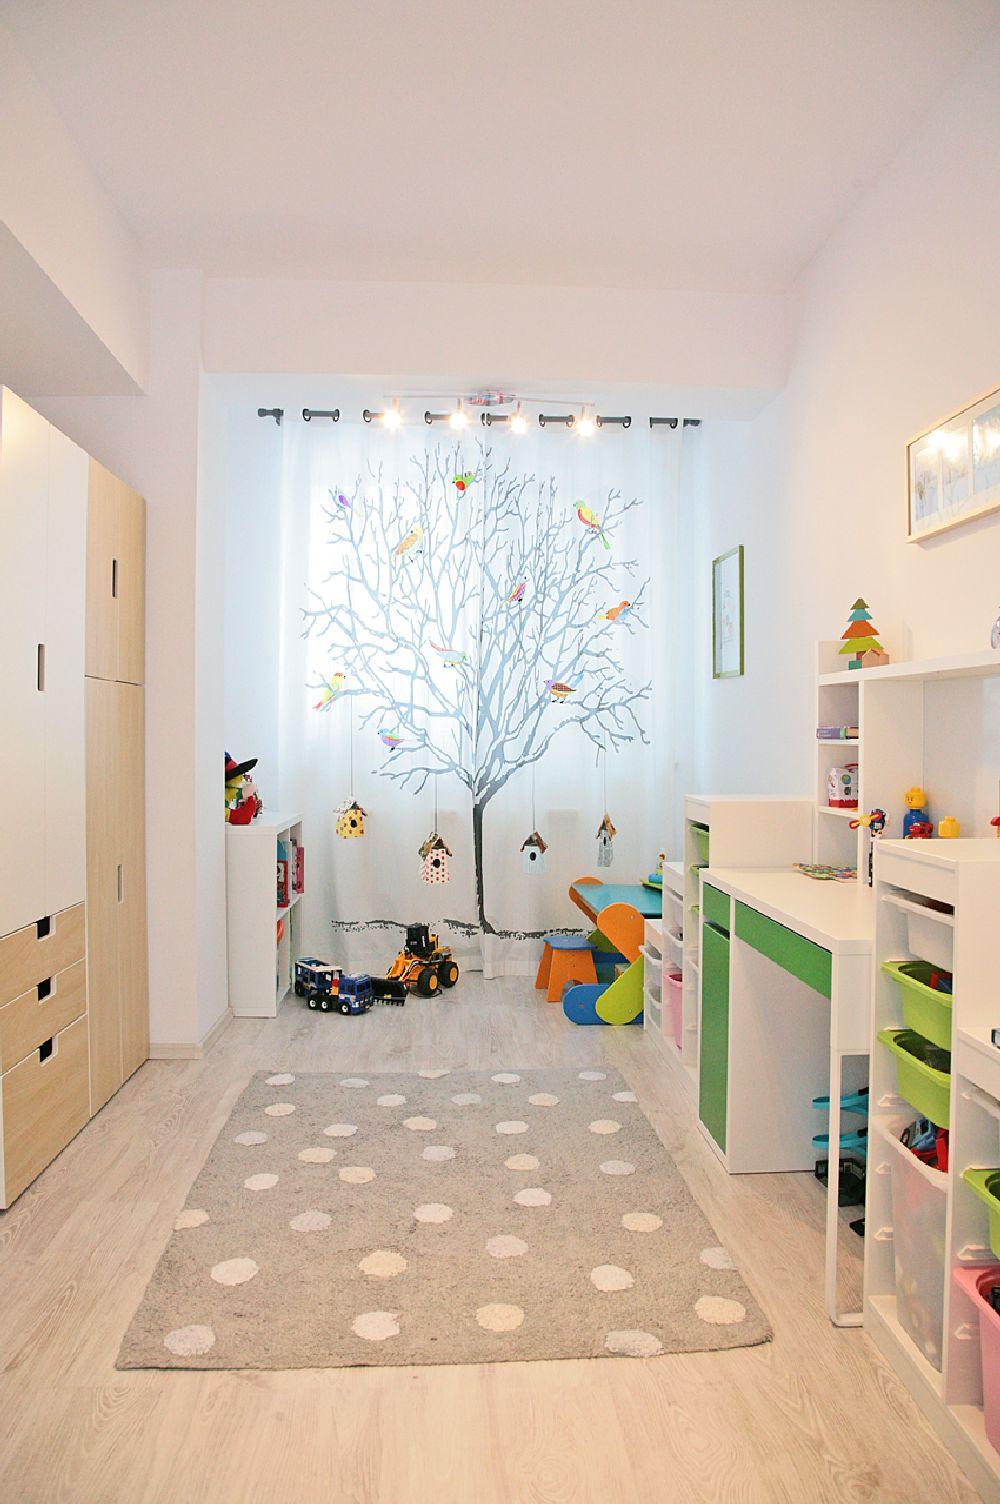 adelaparvu.com despre apartament 3 camere, 75 mp in Bucuresti, design interior Val Decor, Alia Bakutayan si Daniel Tufis, Foto Alia Bakutayan (31)